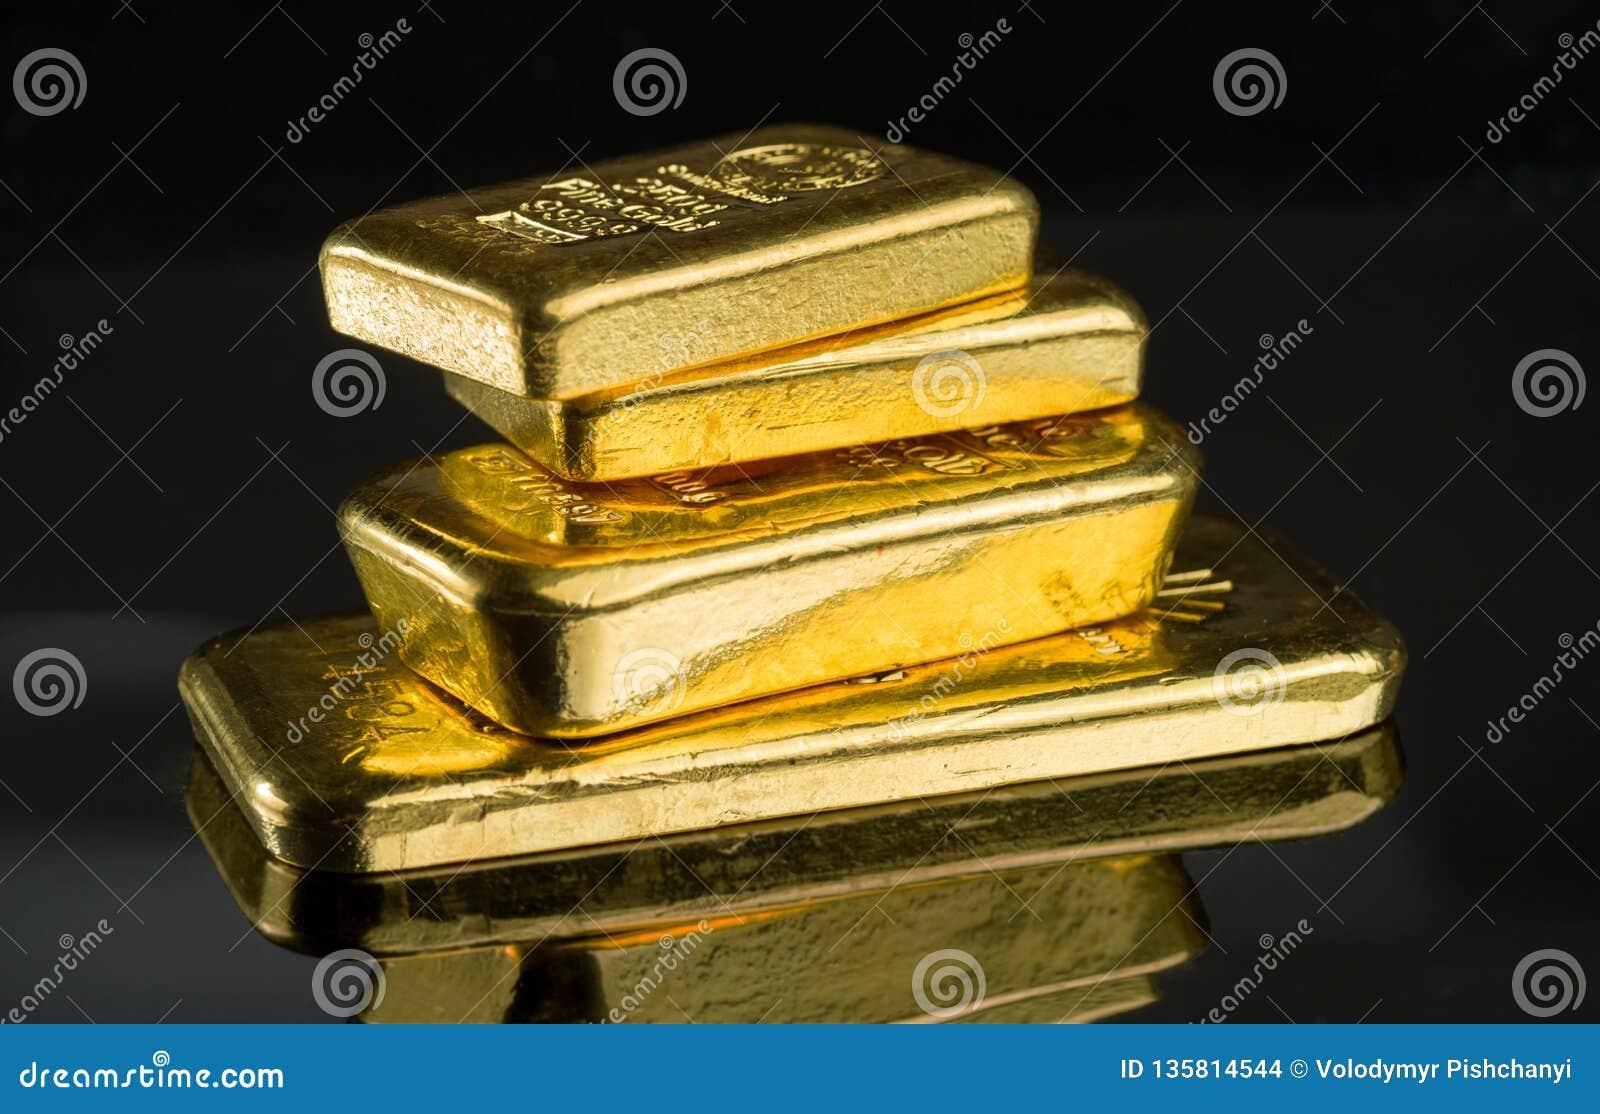 Verscheidene goudstaven van verschillend gewicht op een donkere spiegeloppervlakte